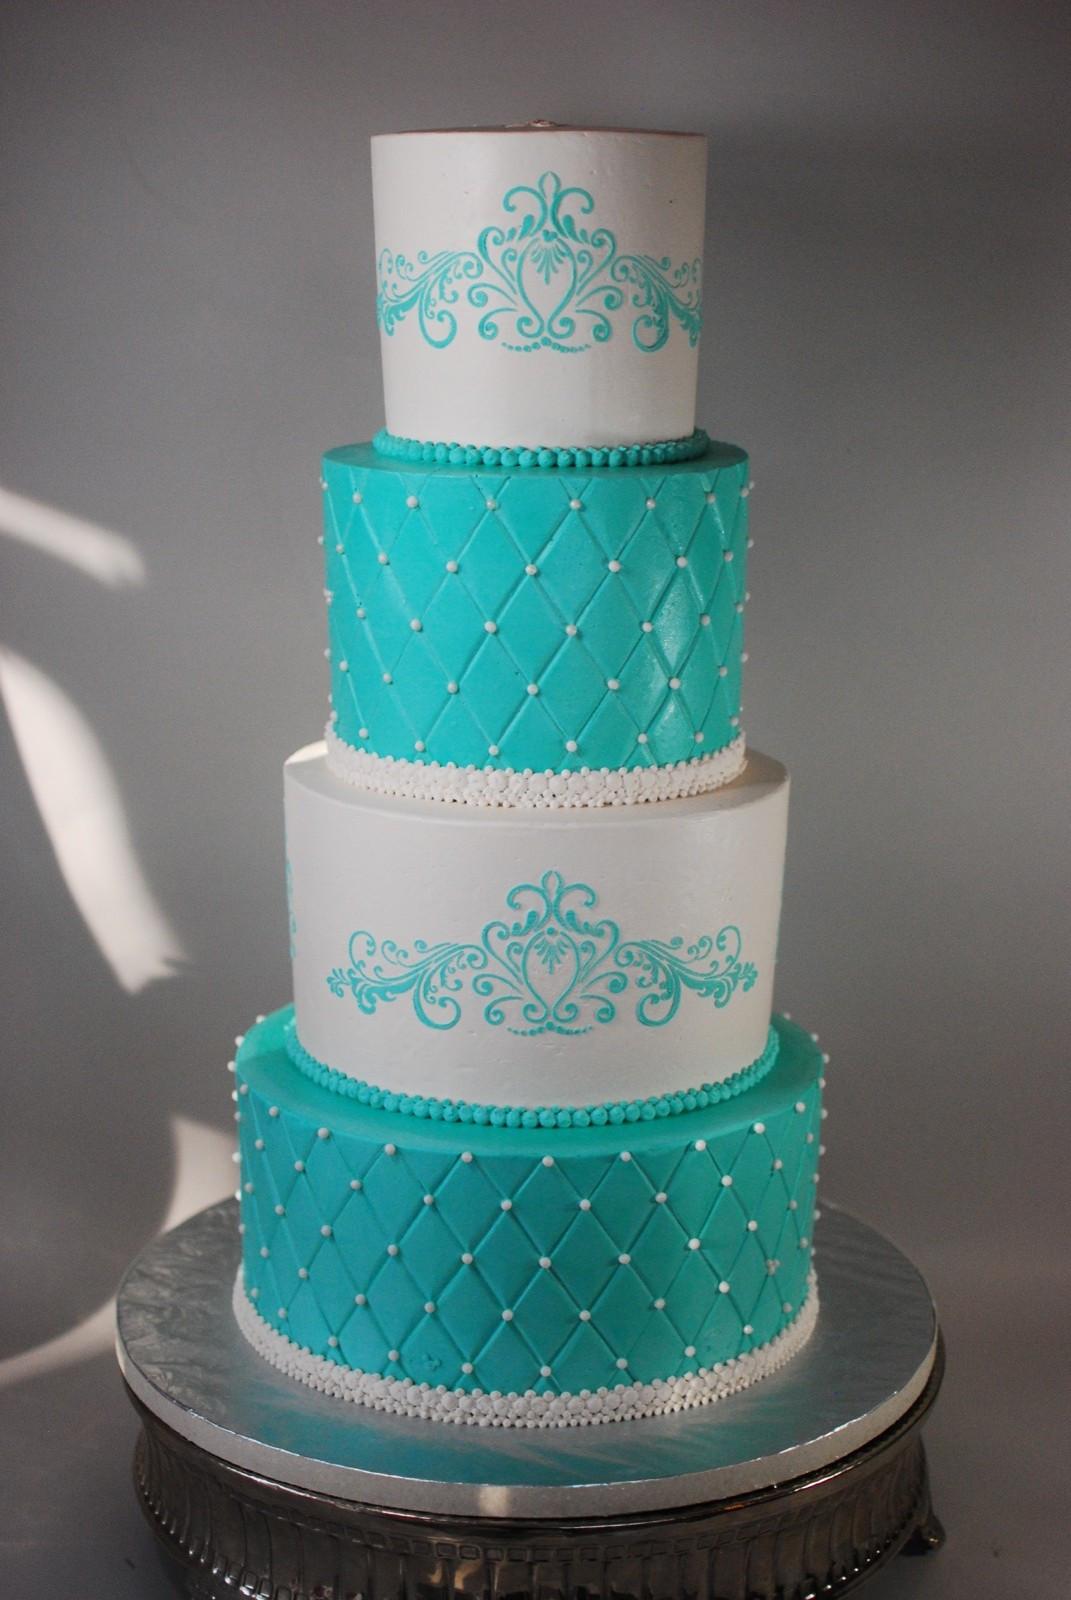 Princess Wedding Cakes  Cup a Dee Cakes Blog Disney Inspired Princess Wedding